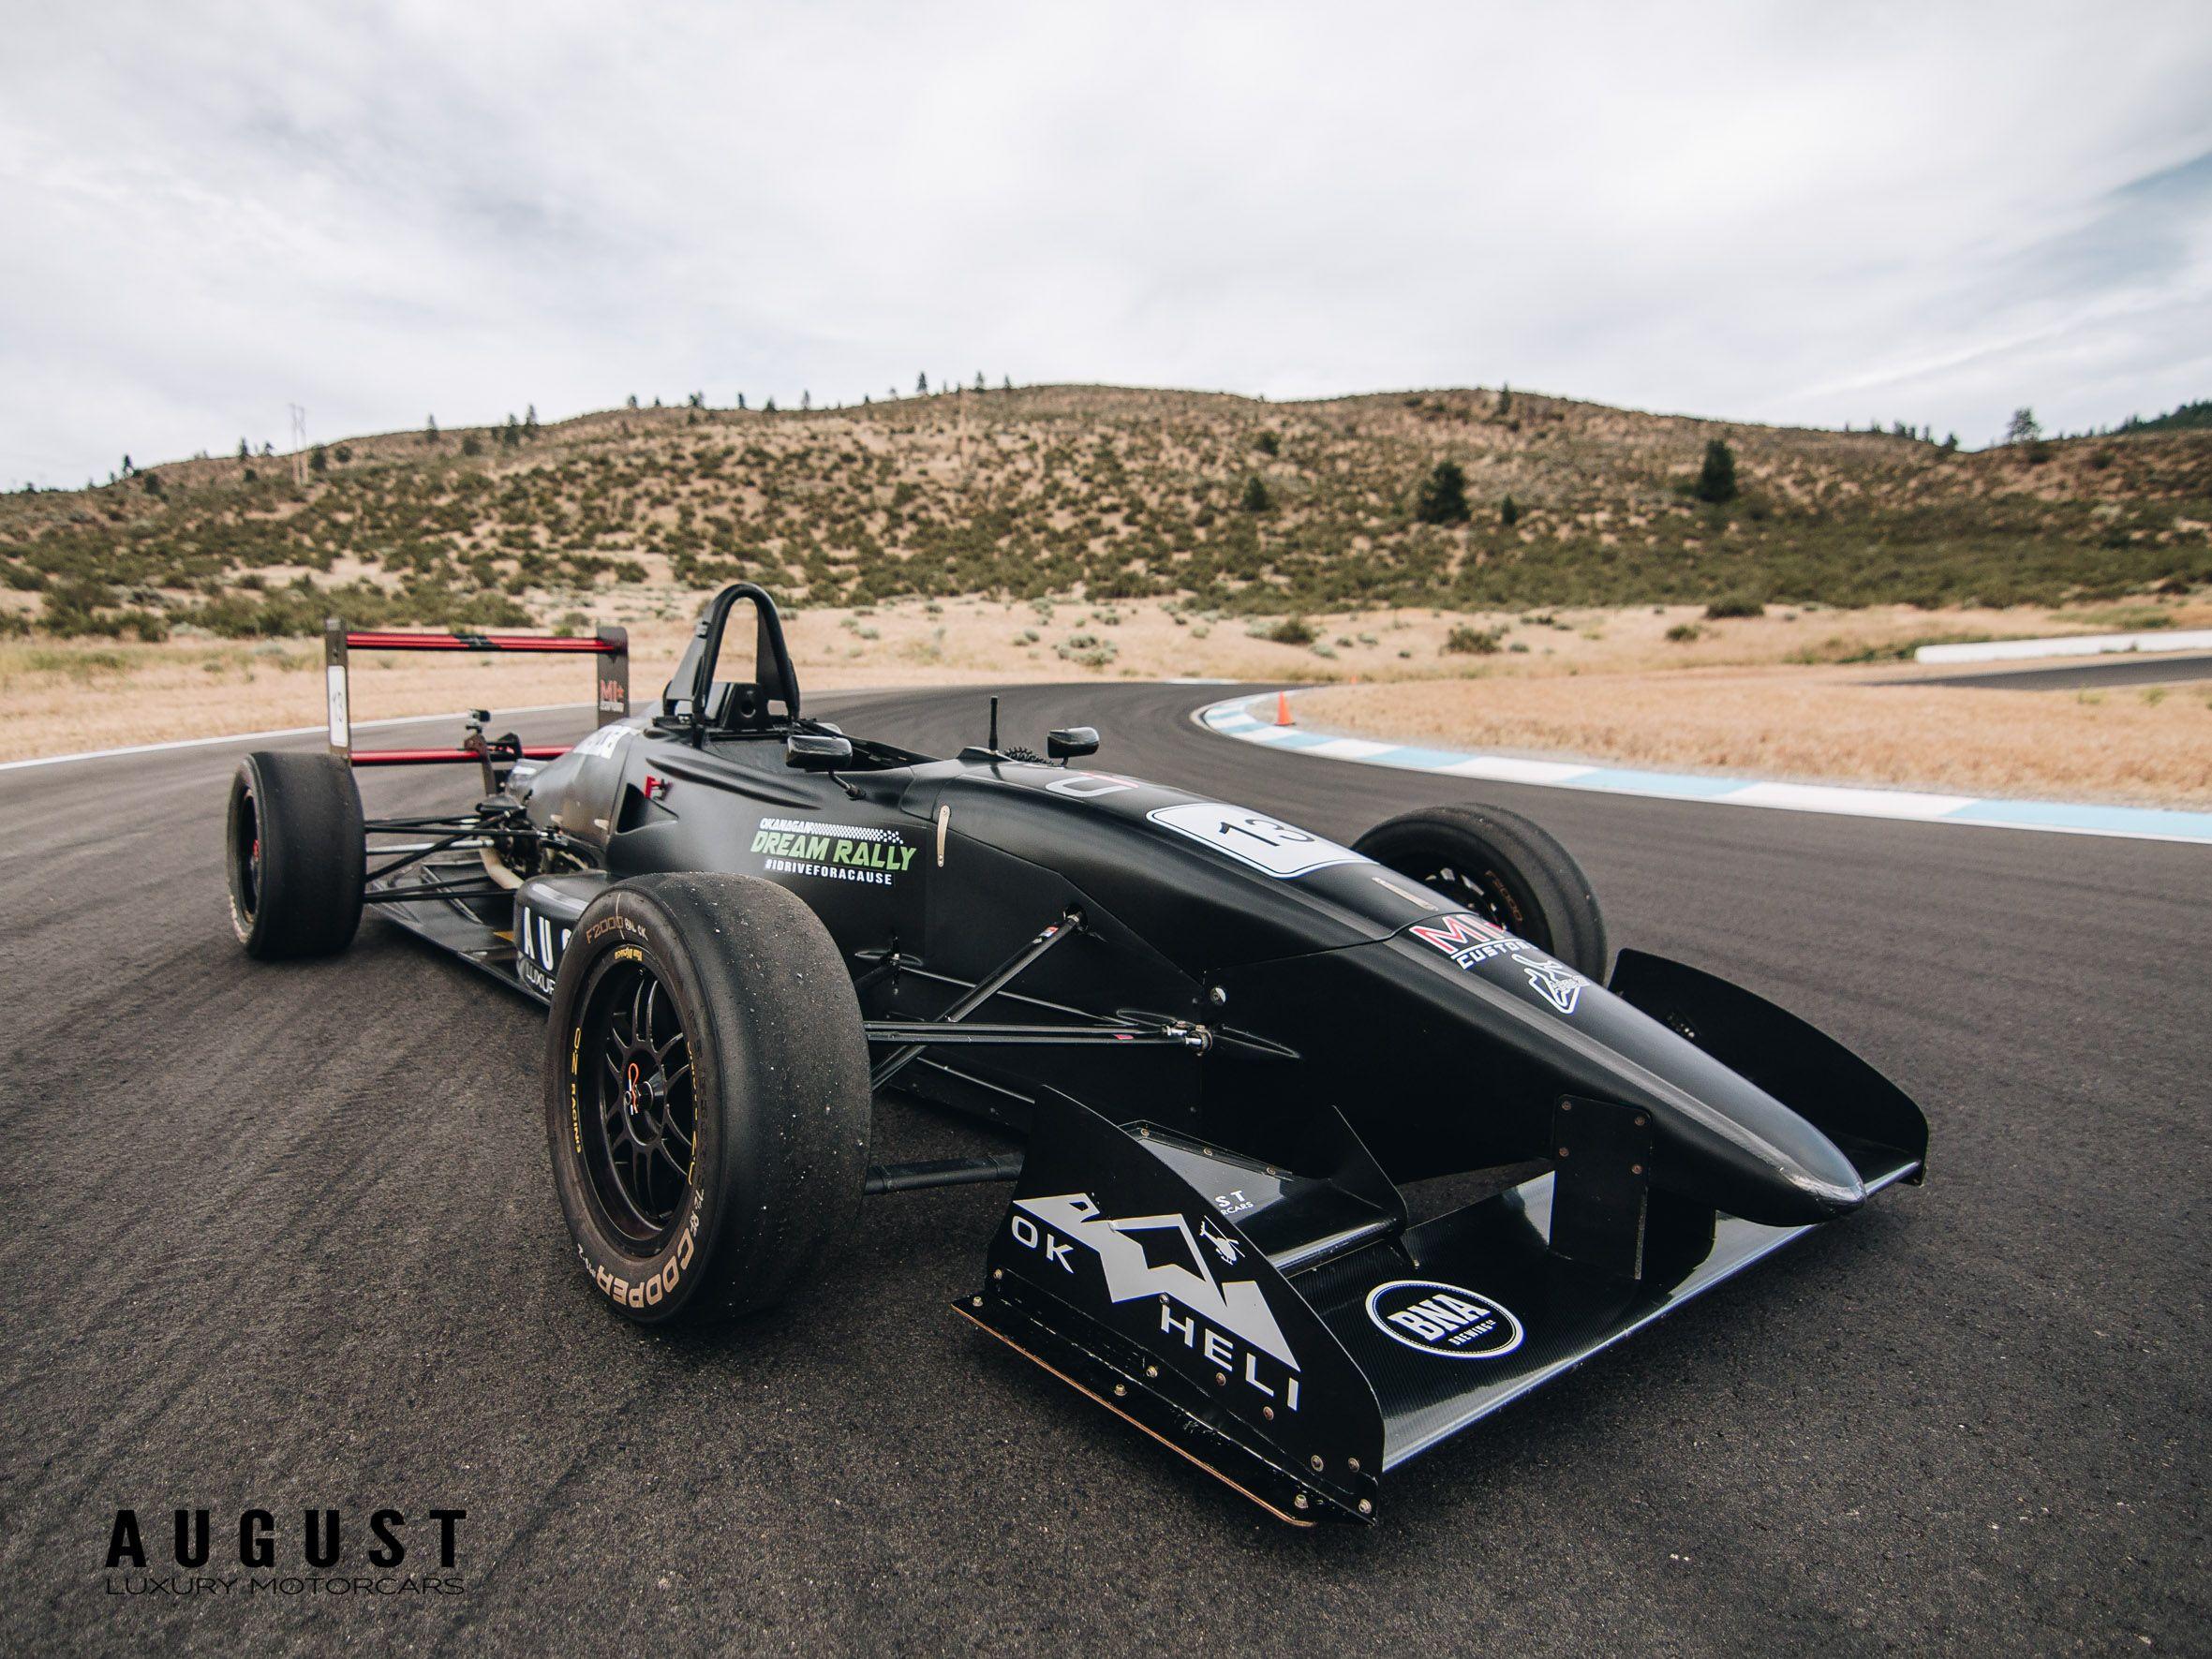 Pre-Owned 2010 Elan DP08 USF2000 Race Car